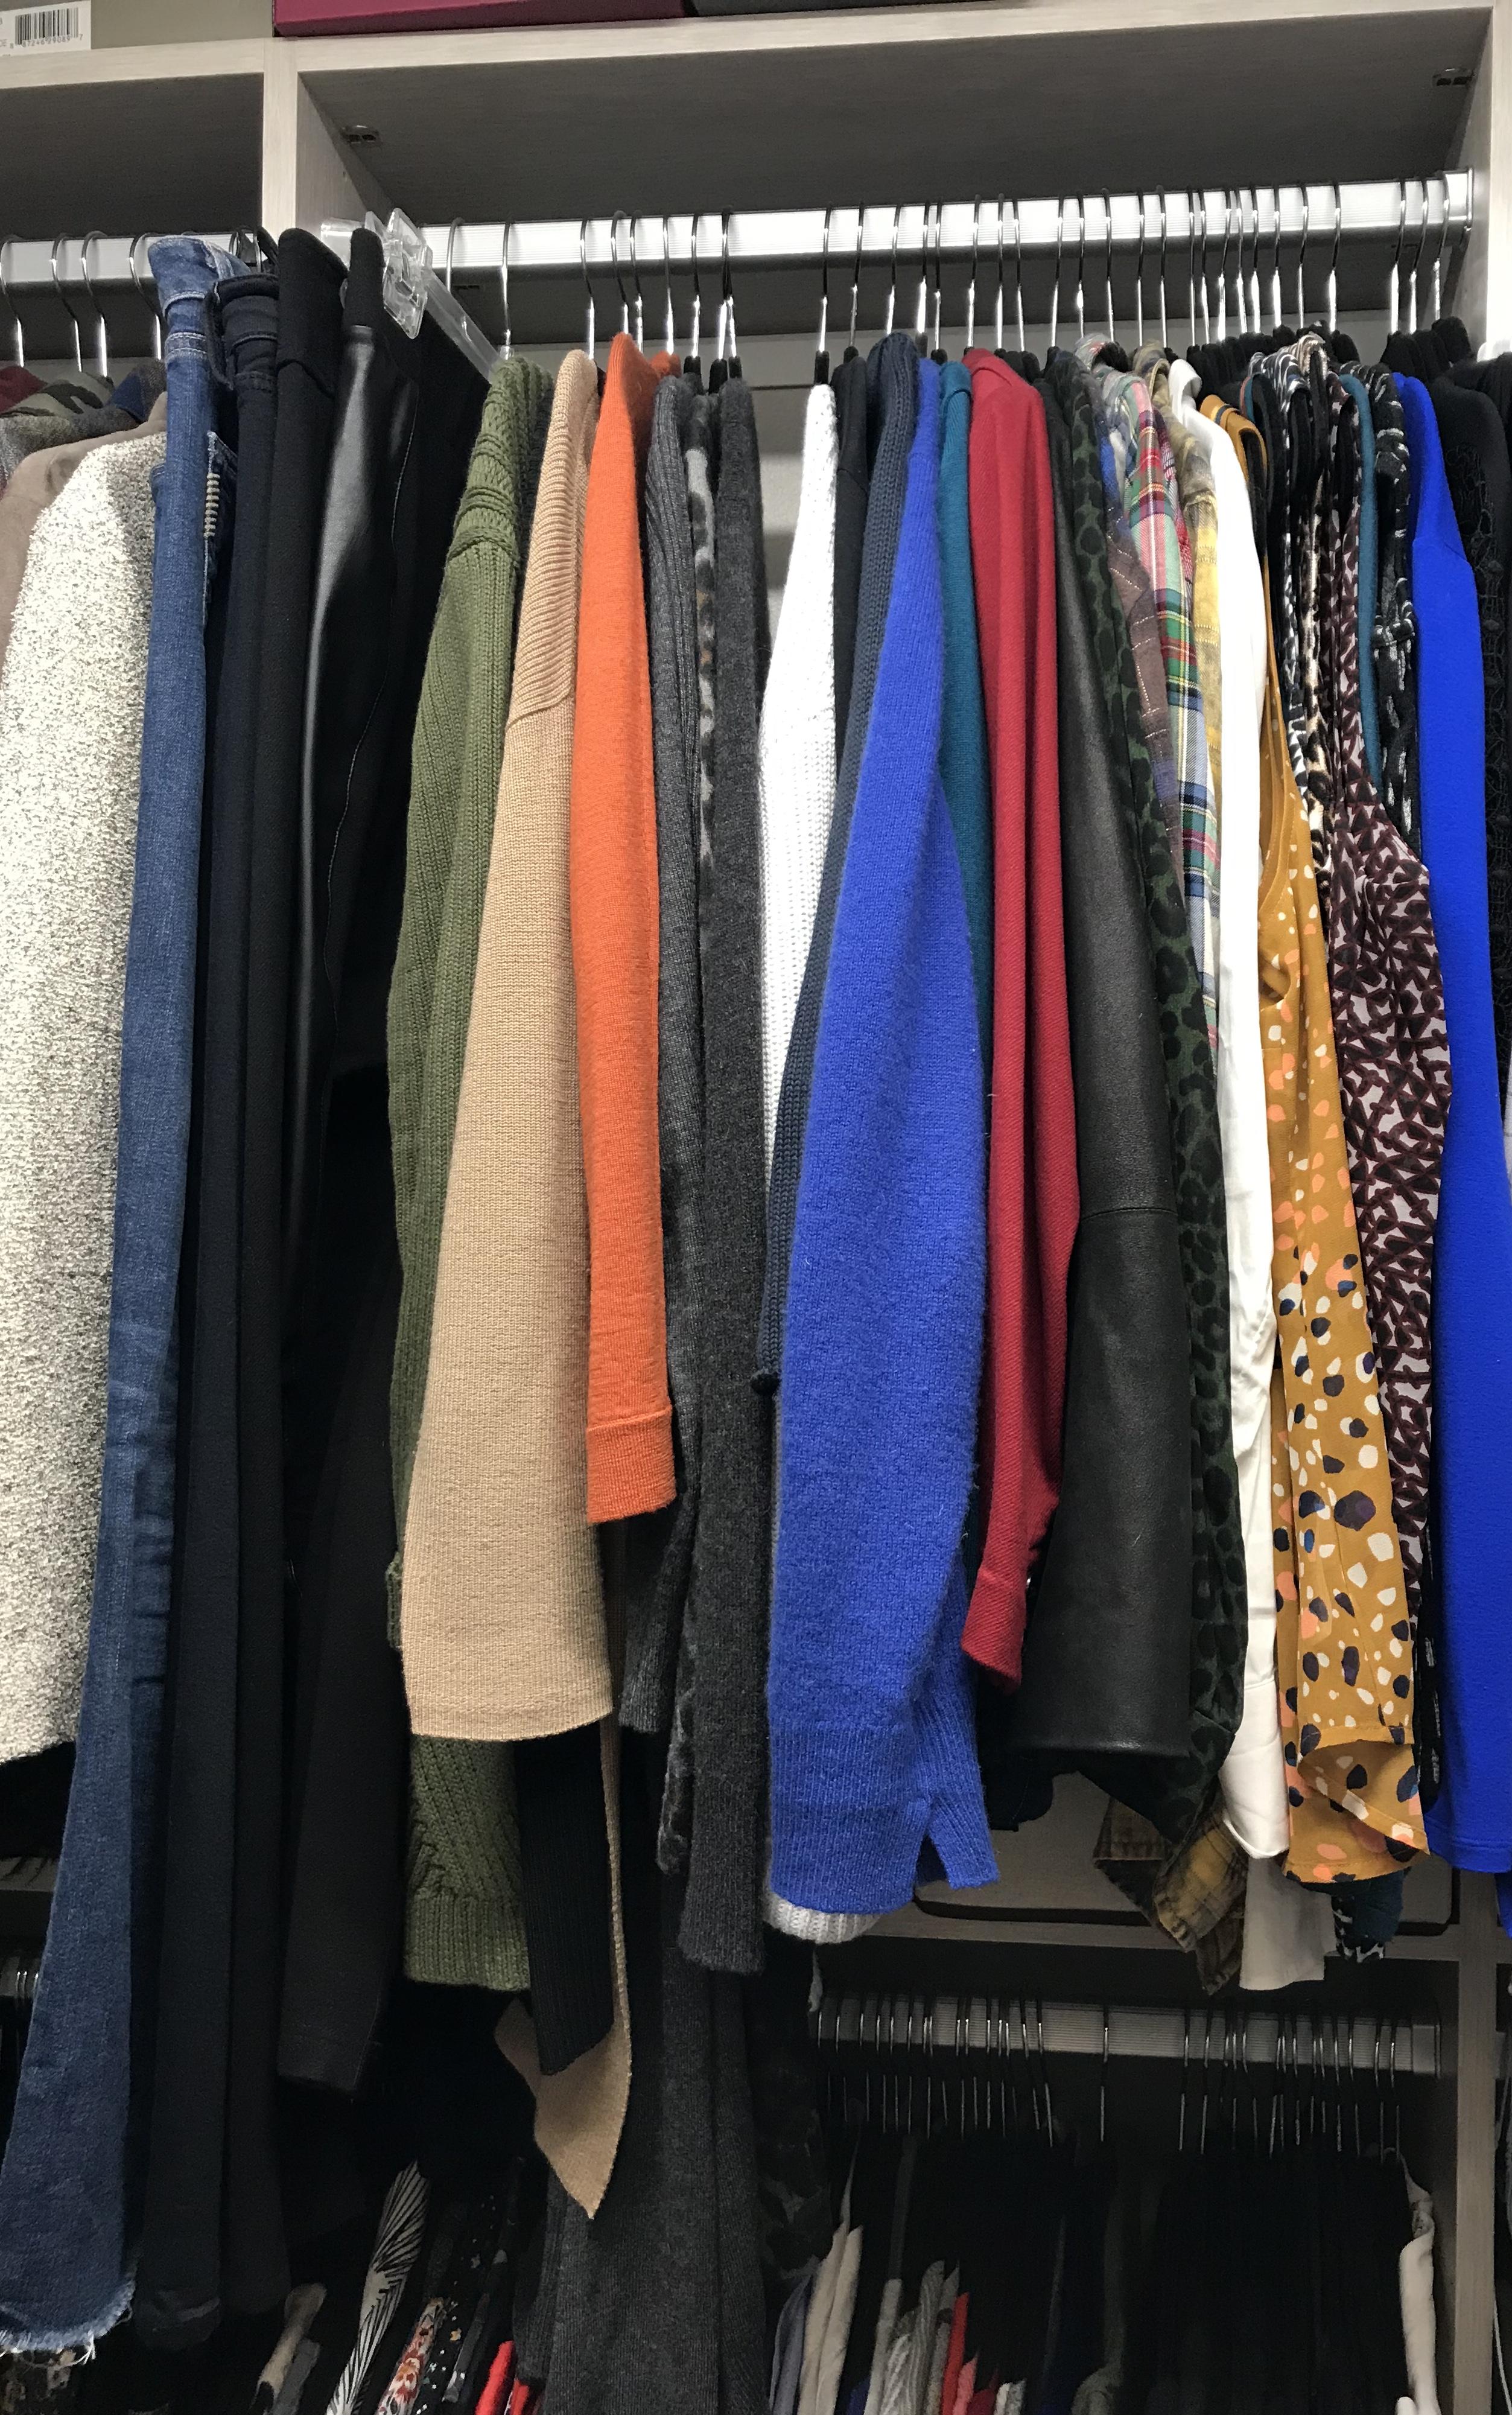 Three Reasons the Capsule Wardrobe Works